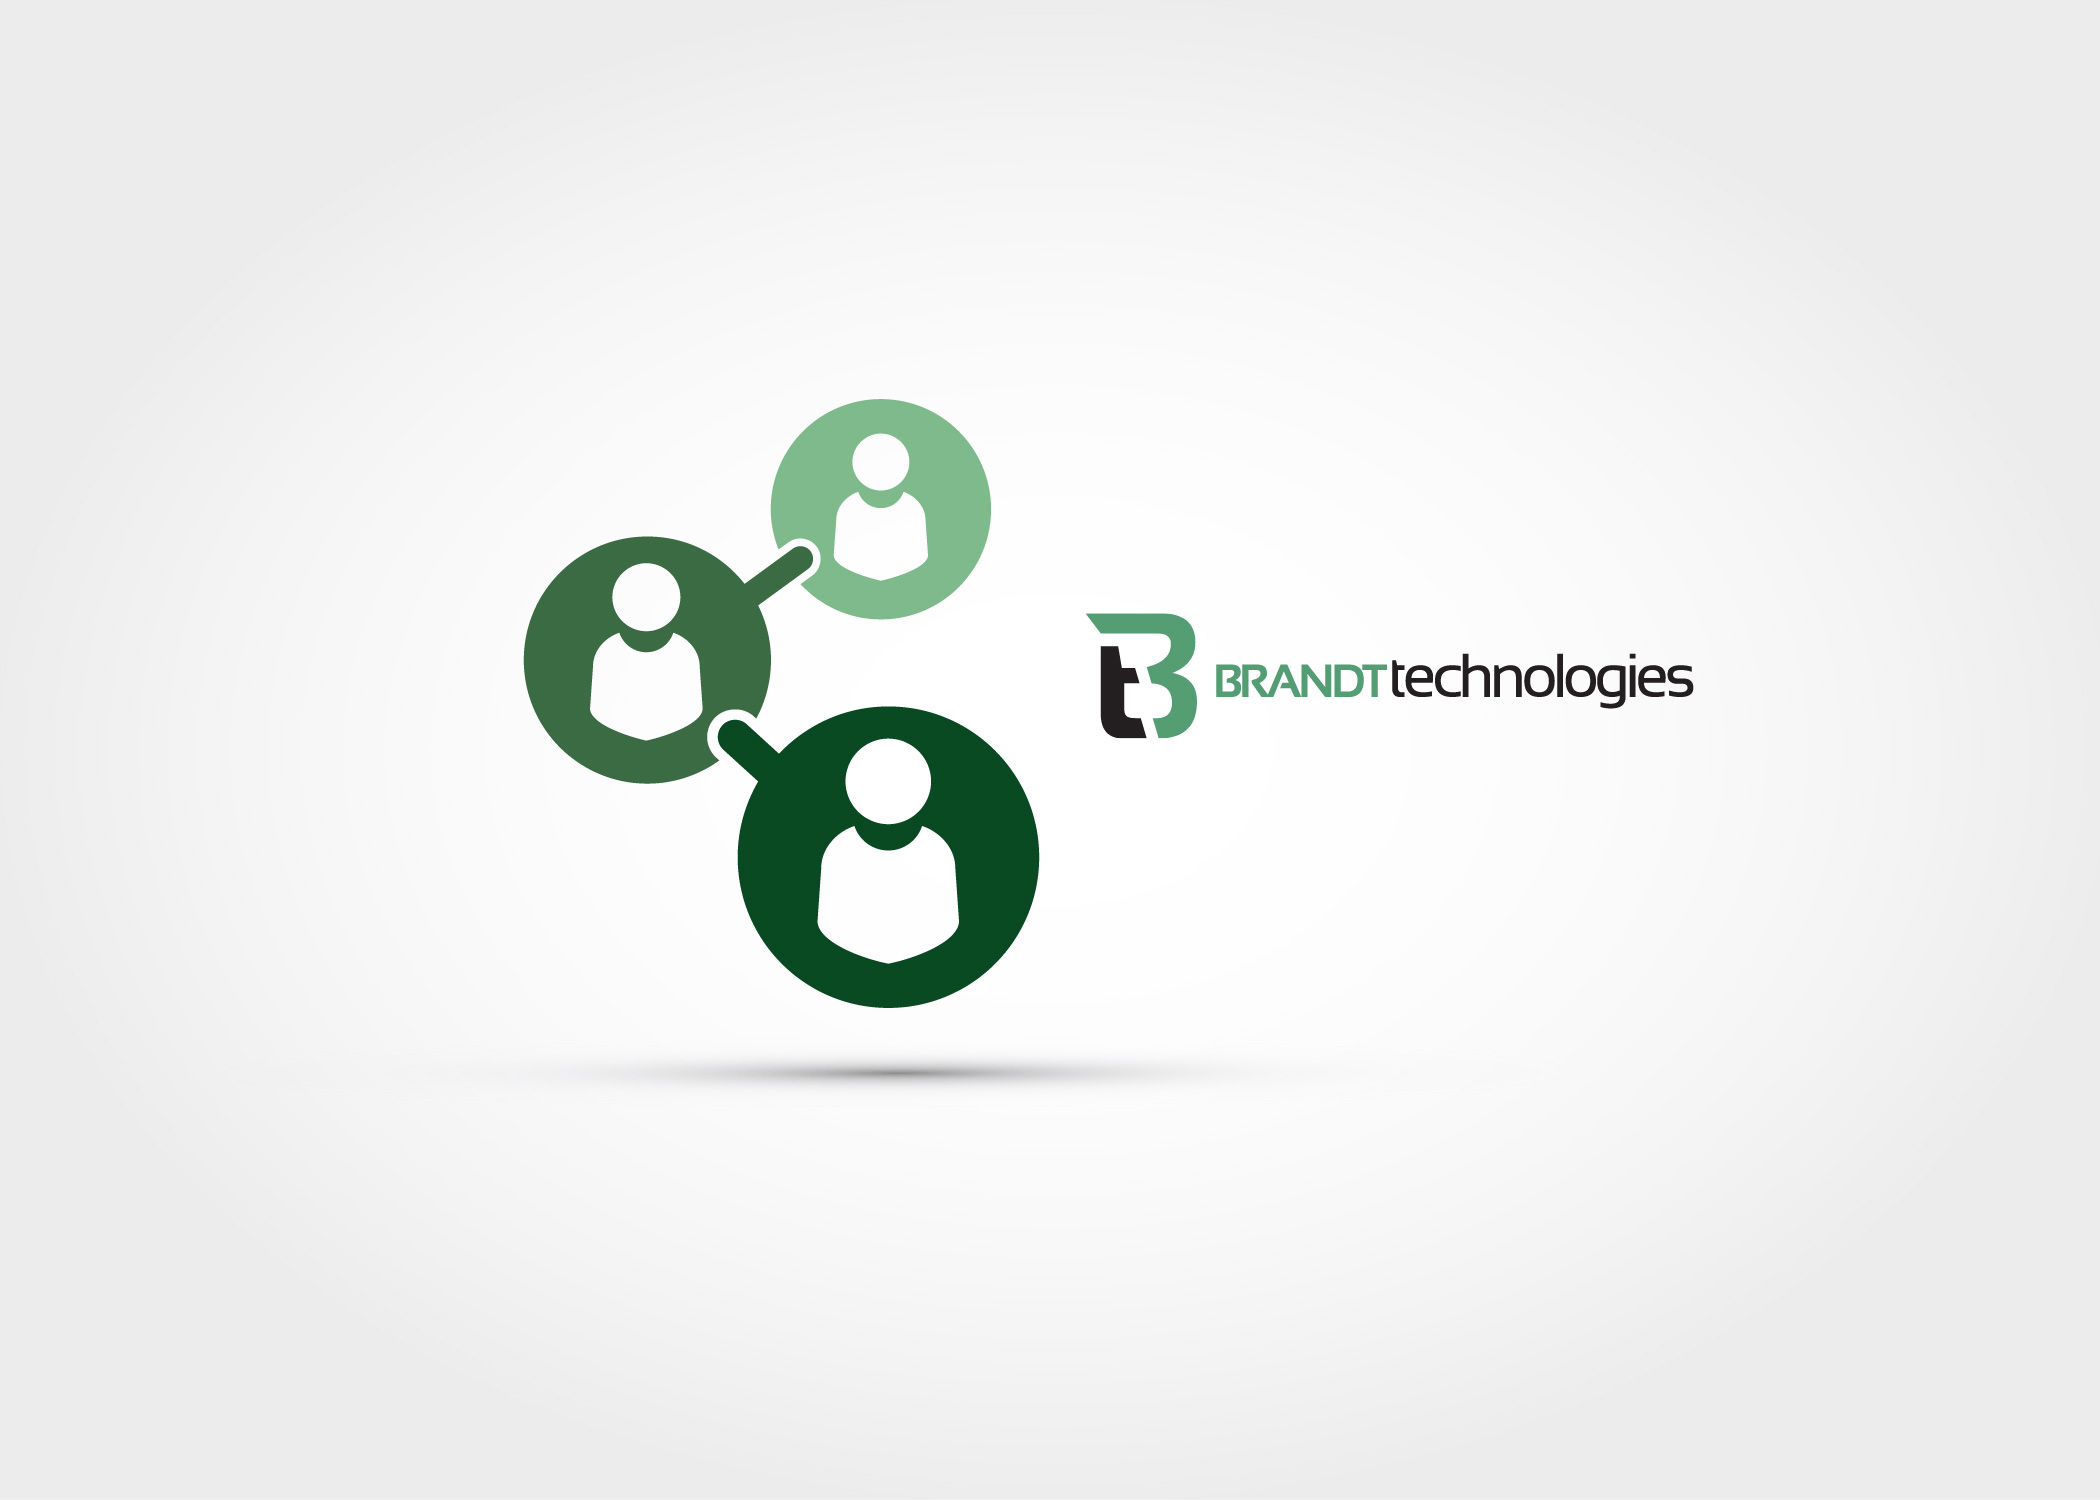 Brandt Technologies Connections